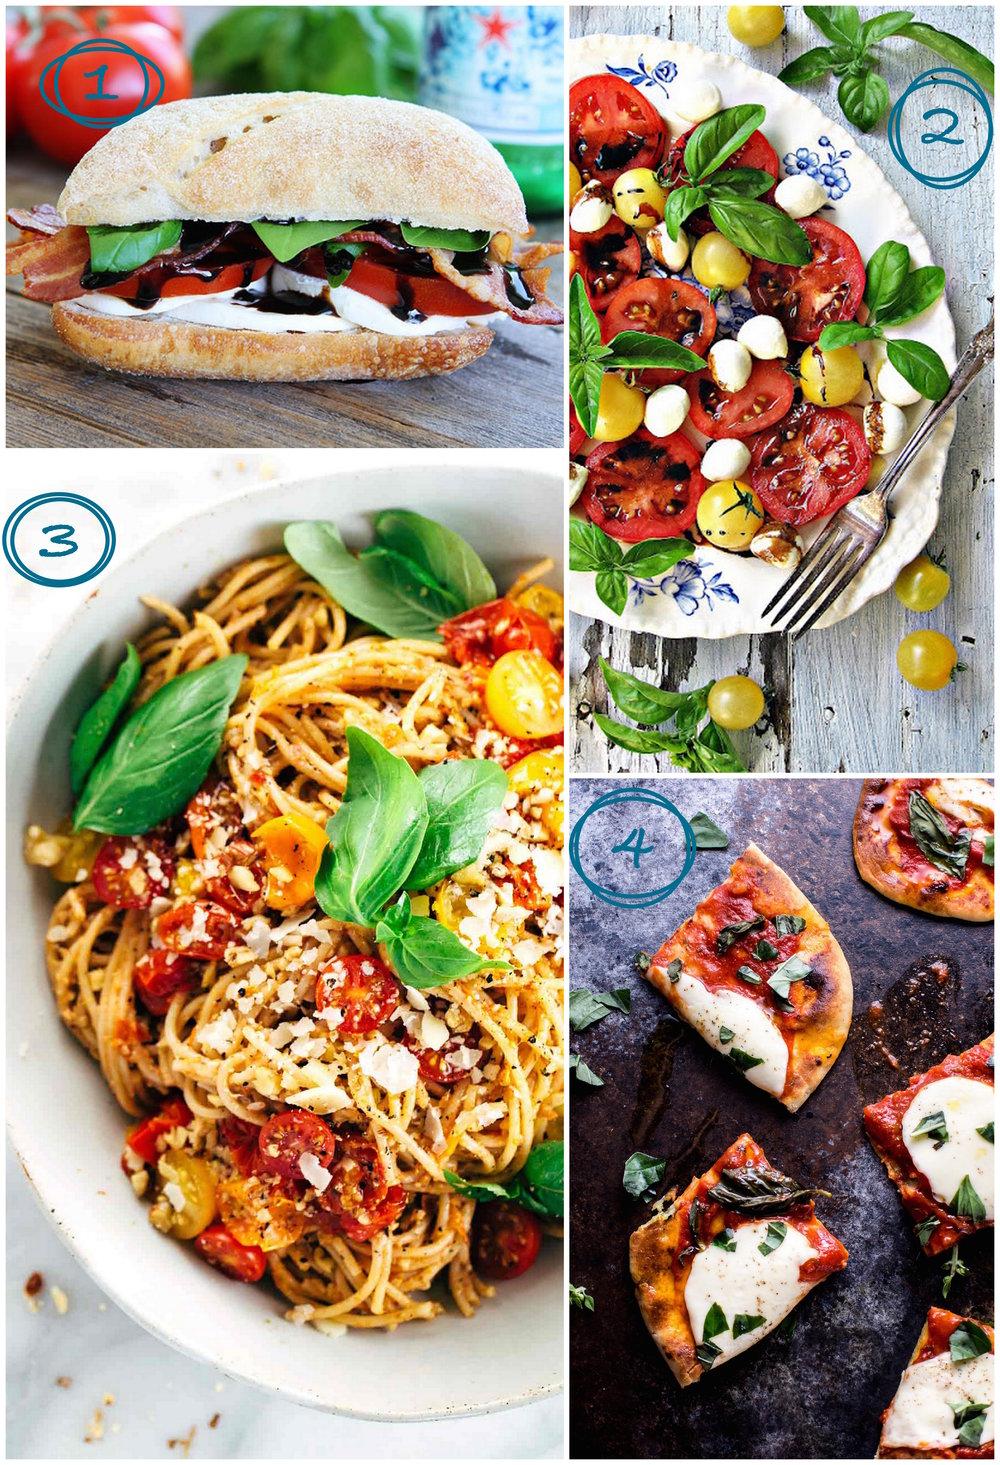 Uses-for-Sweet-Basil-Cassia-Co.jpg